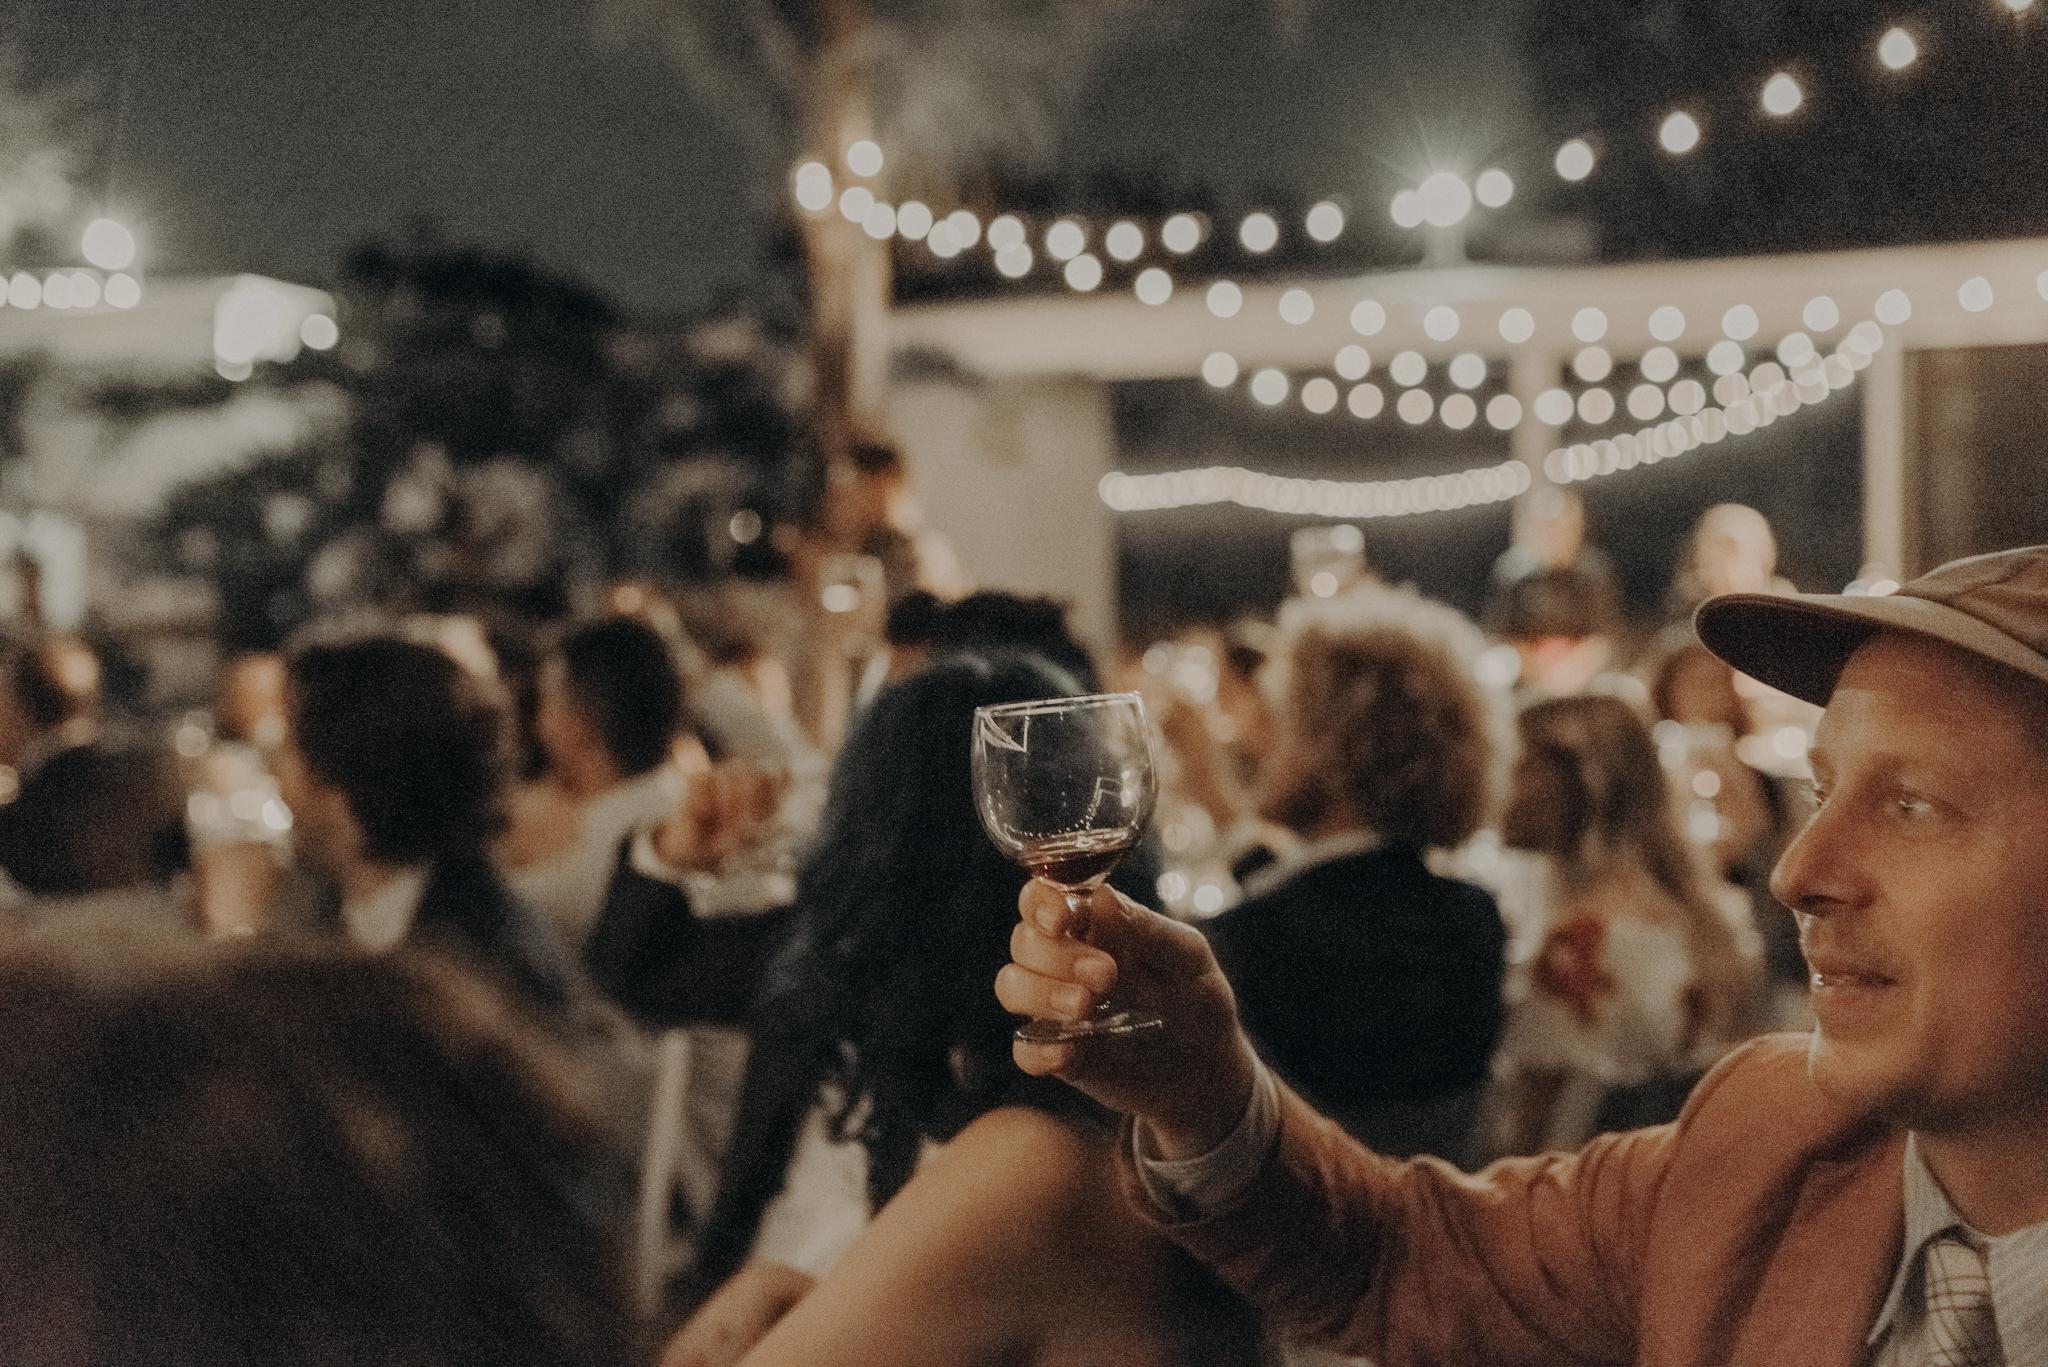 Isaiah + Taylor Photography - Private Estate Backyard Wedding - Beverly Hills - Los Angeles Wedding Photographer - 139.jpg